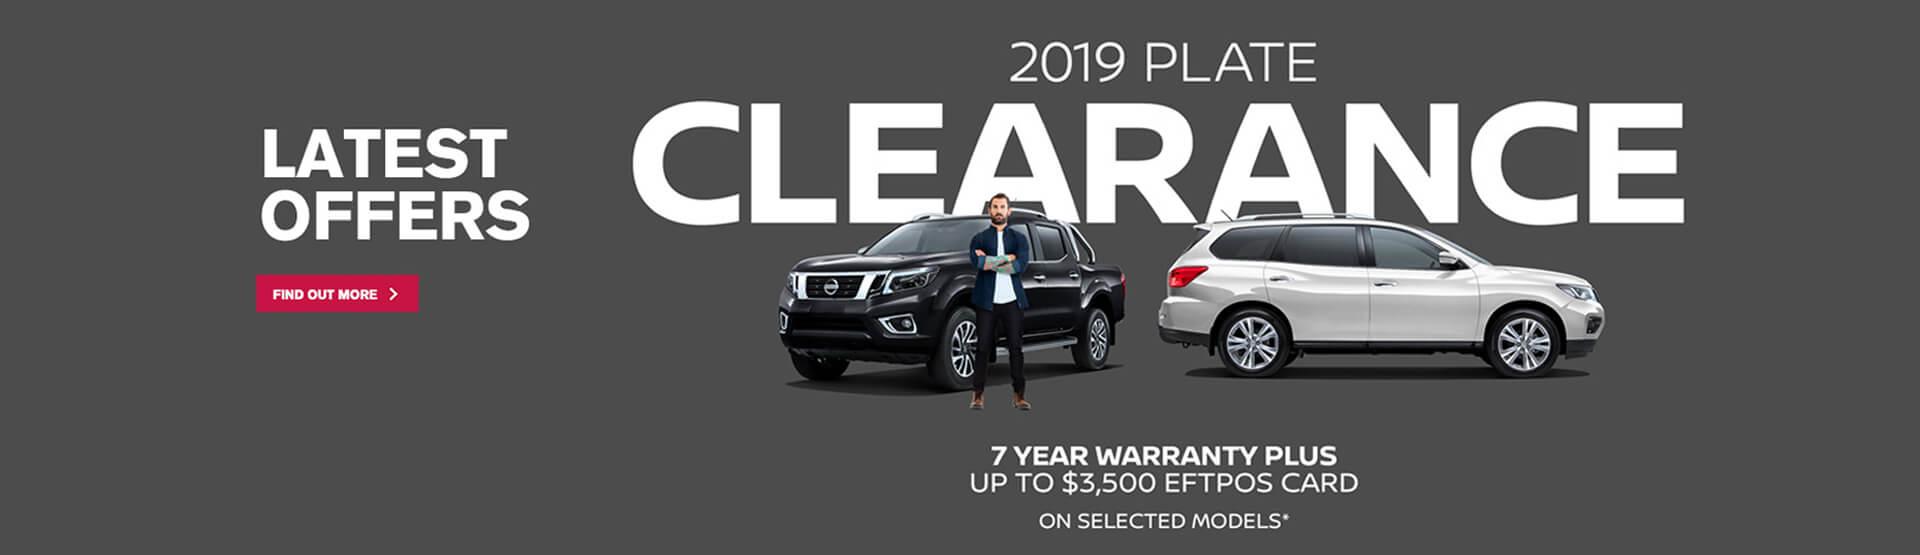 2019 Nissan Plate Clearance